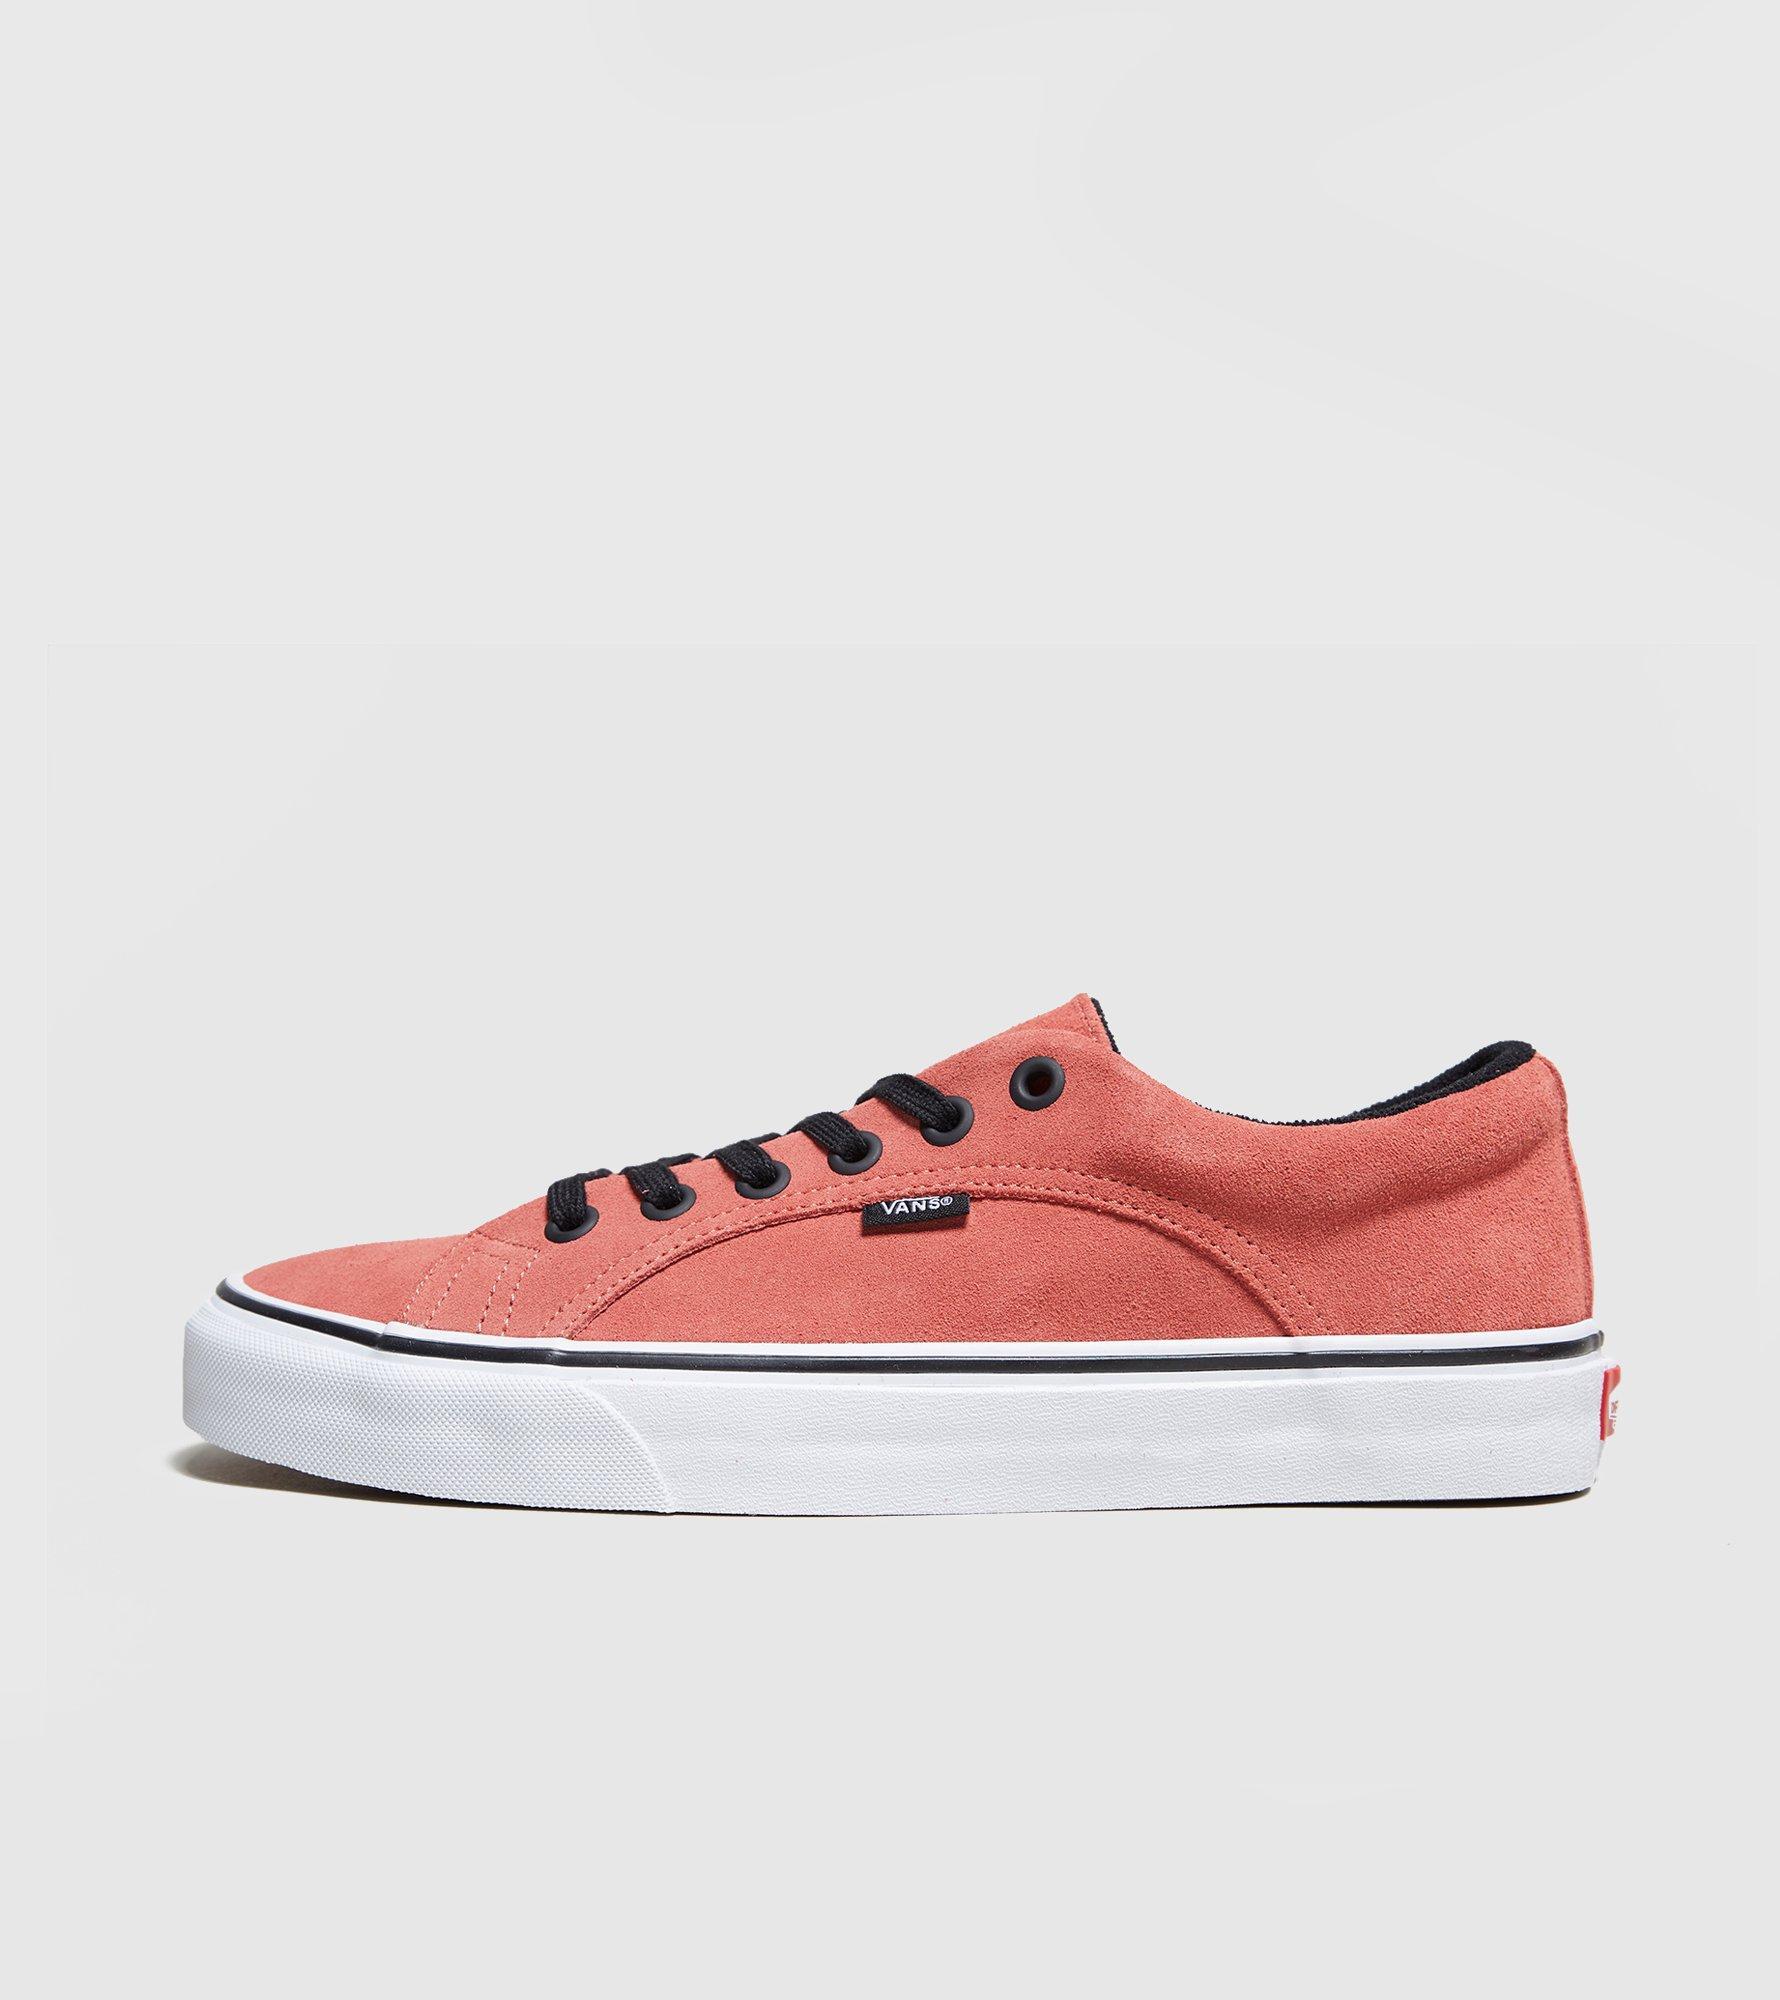 4d0690103a546f Vans Lampin in Pink for Men - Lyst